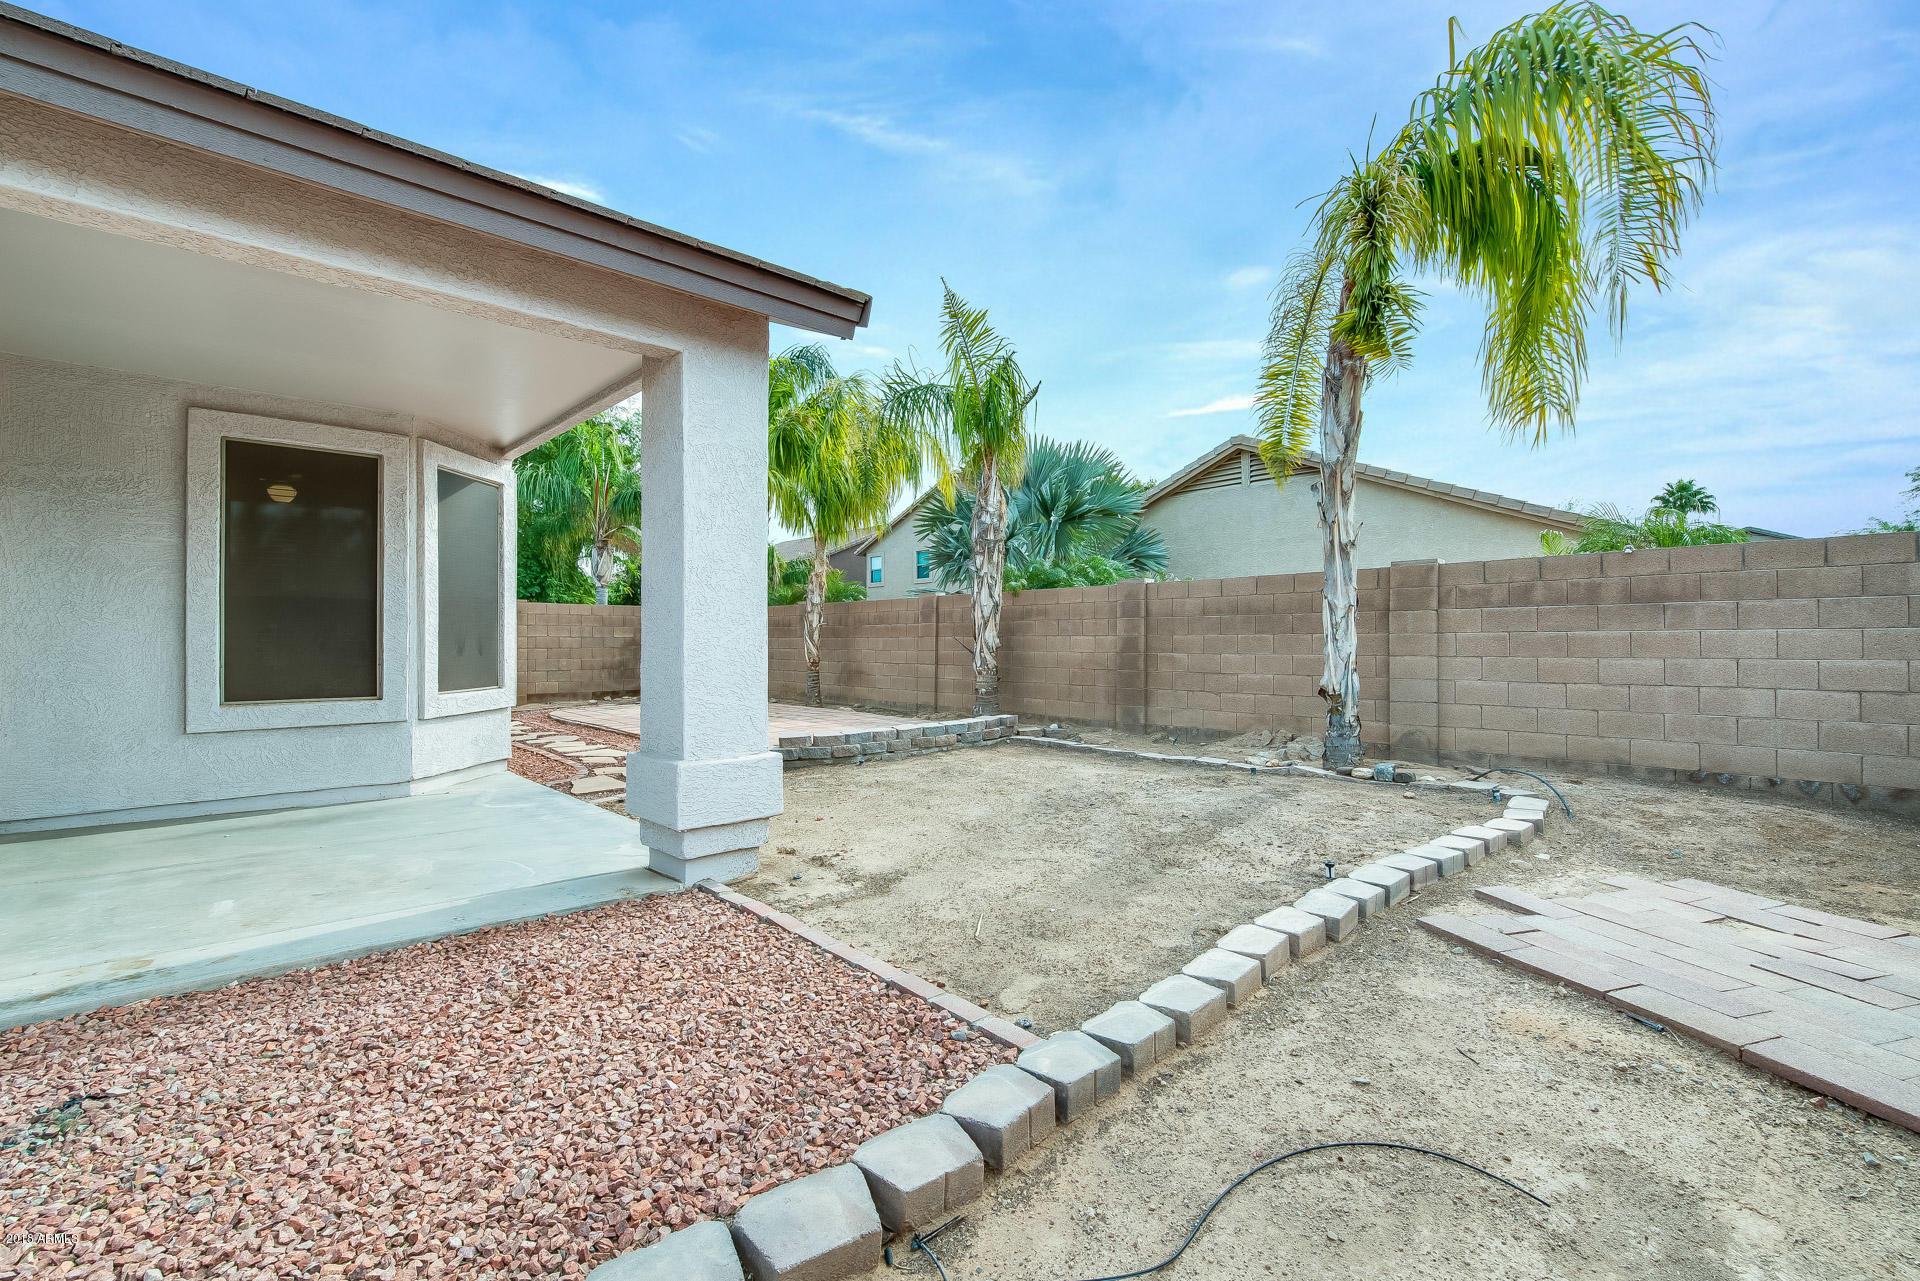 MLS 5847554 8995 W MARY ANN Drive, Peoria, AZ 85382 Peoria AZ Dove Valley Ranch